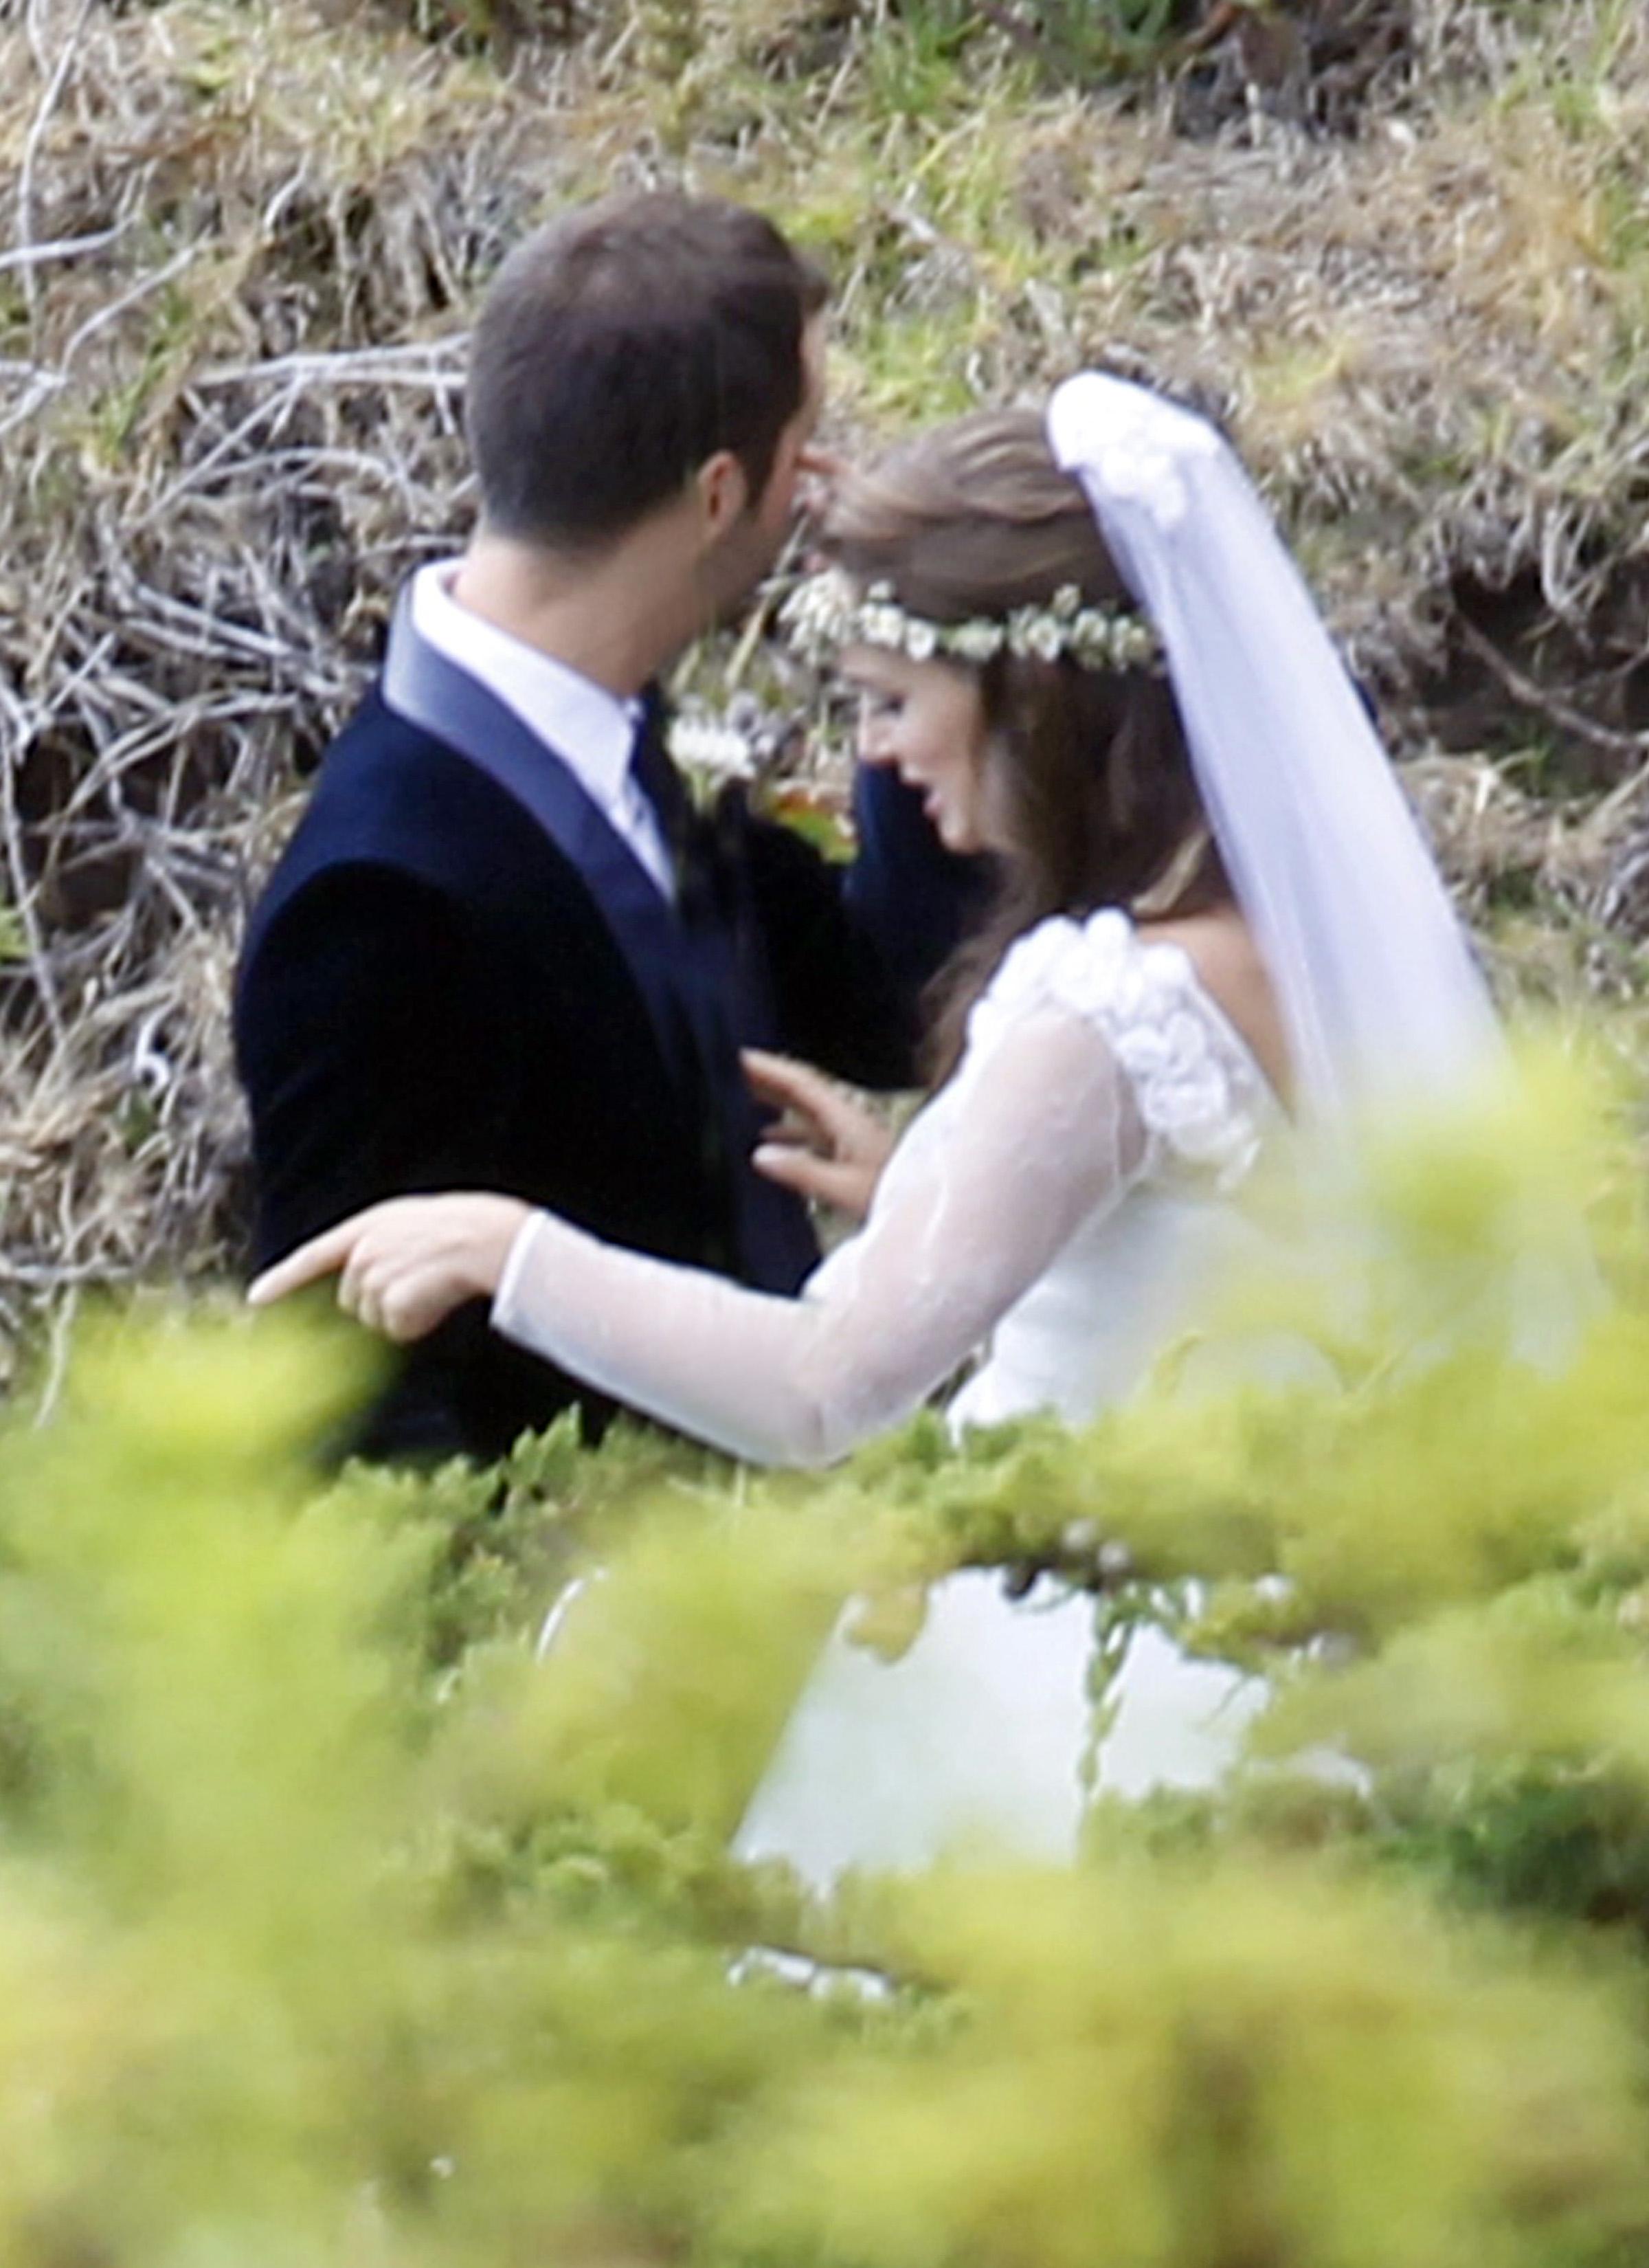 Свадьба Натали Портман и